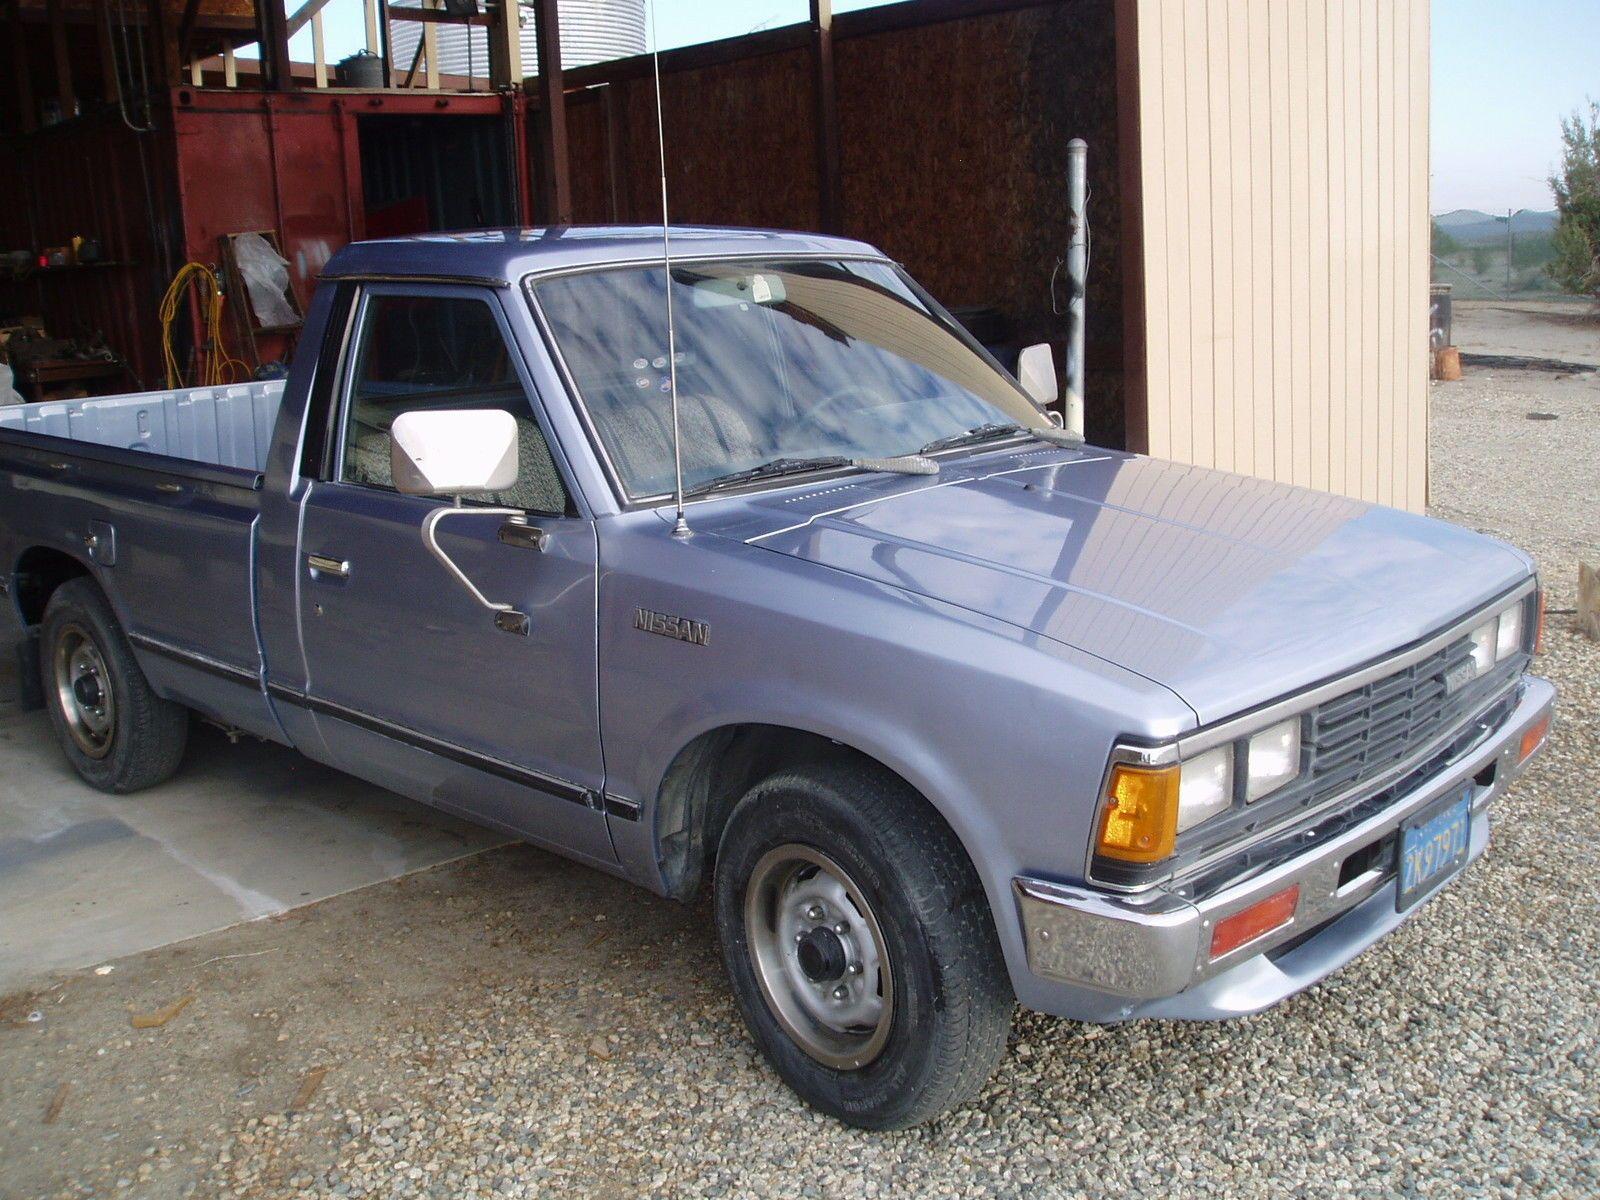 Nissan 720 truck for sale 1984 nissan 720 truck for sale 1984 nissan